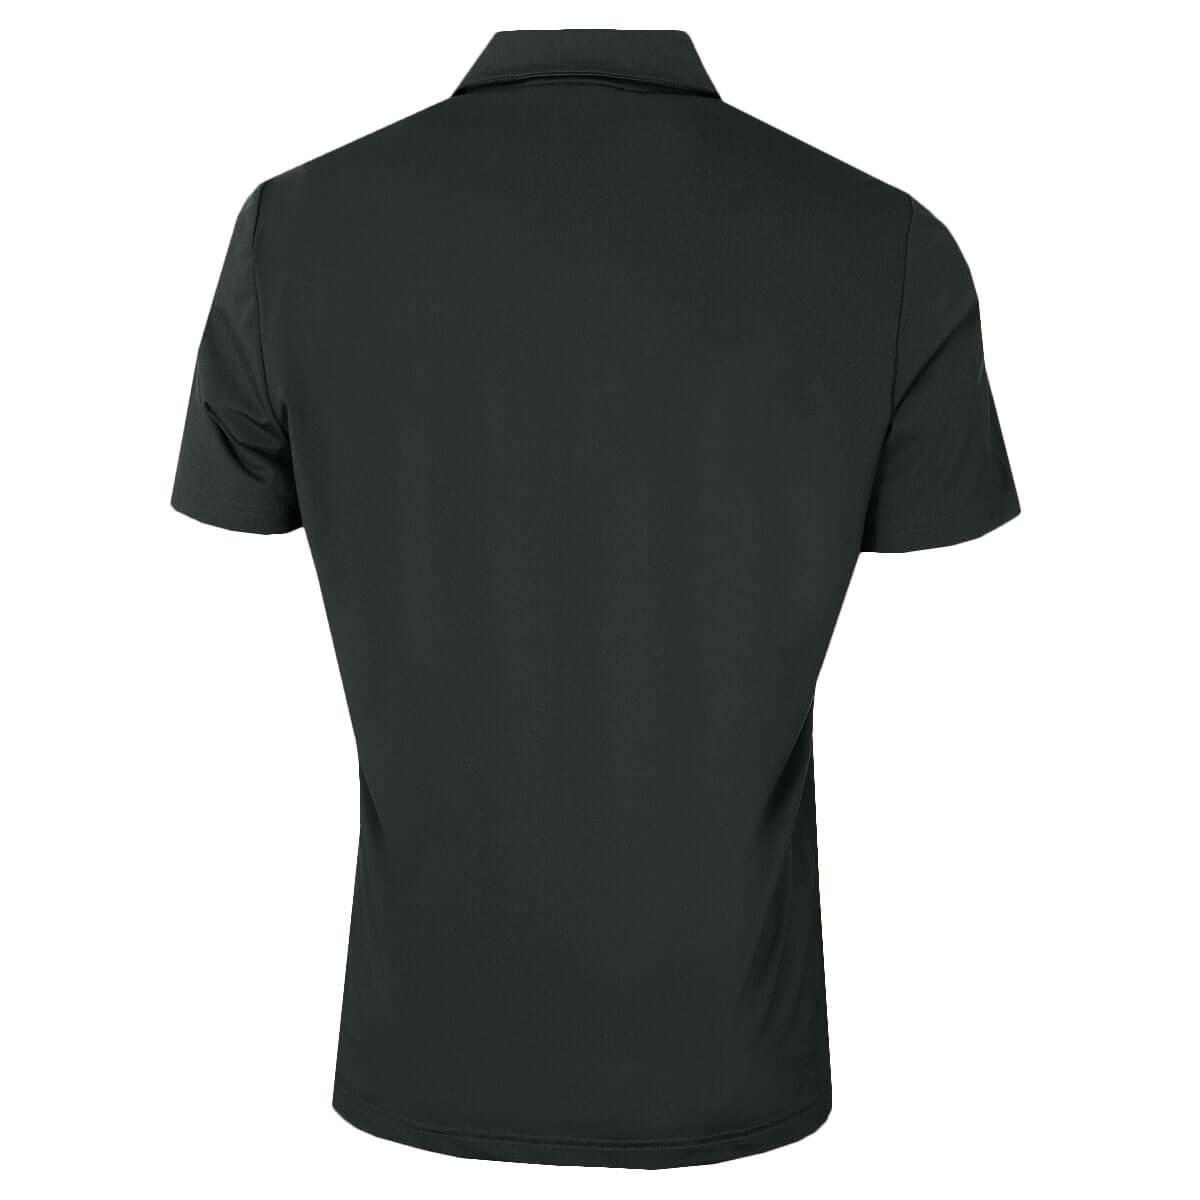 Adidas-Golf-Men-039-s-Ultimate-2-0-Solid-Crestable-Polo-Shirt thumbnail 19